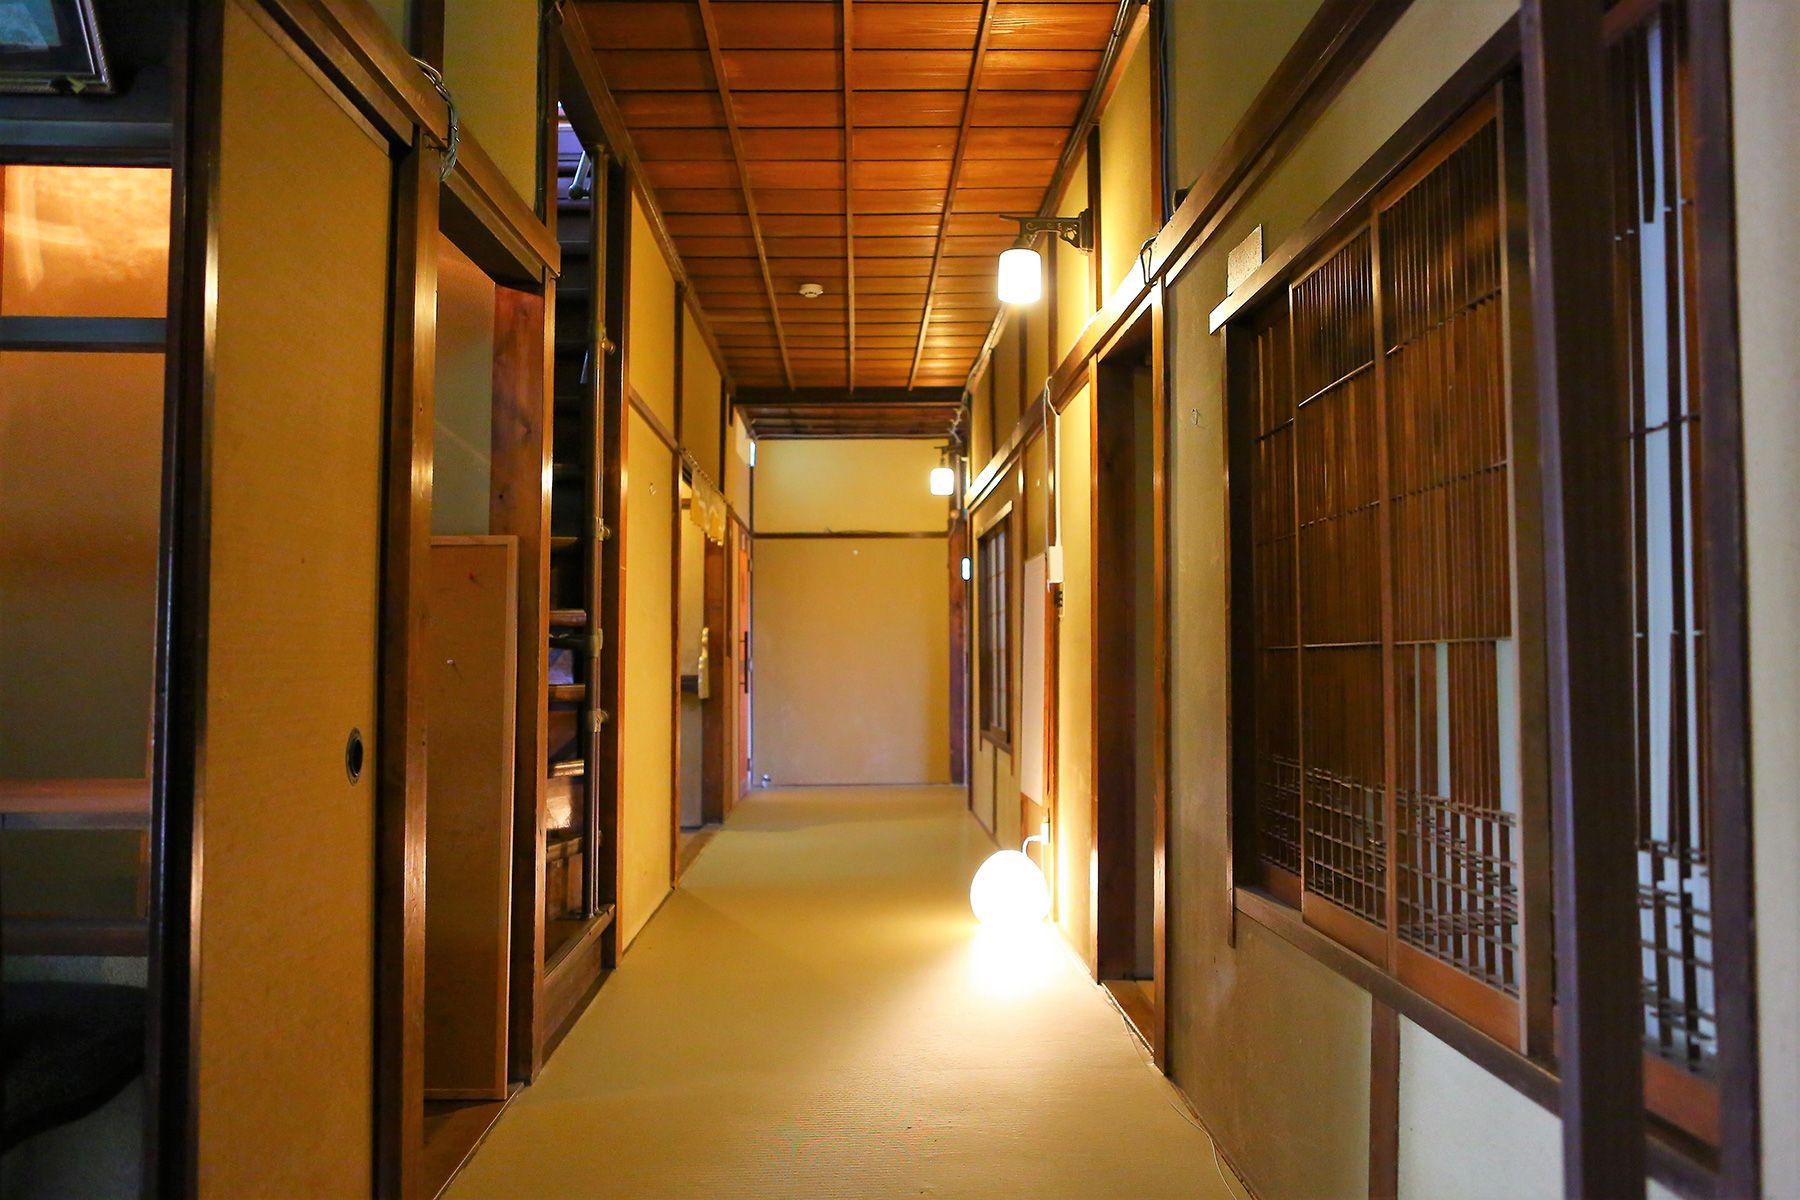 旅館 喜多屋 (キタヤ)1階廊下